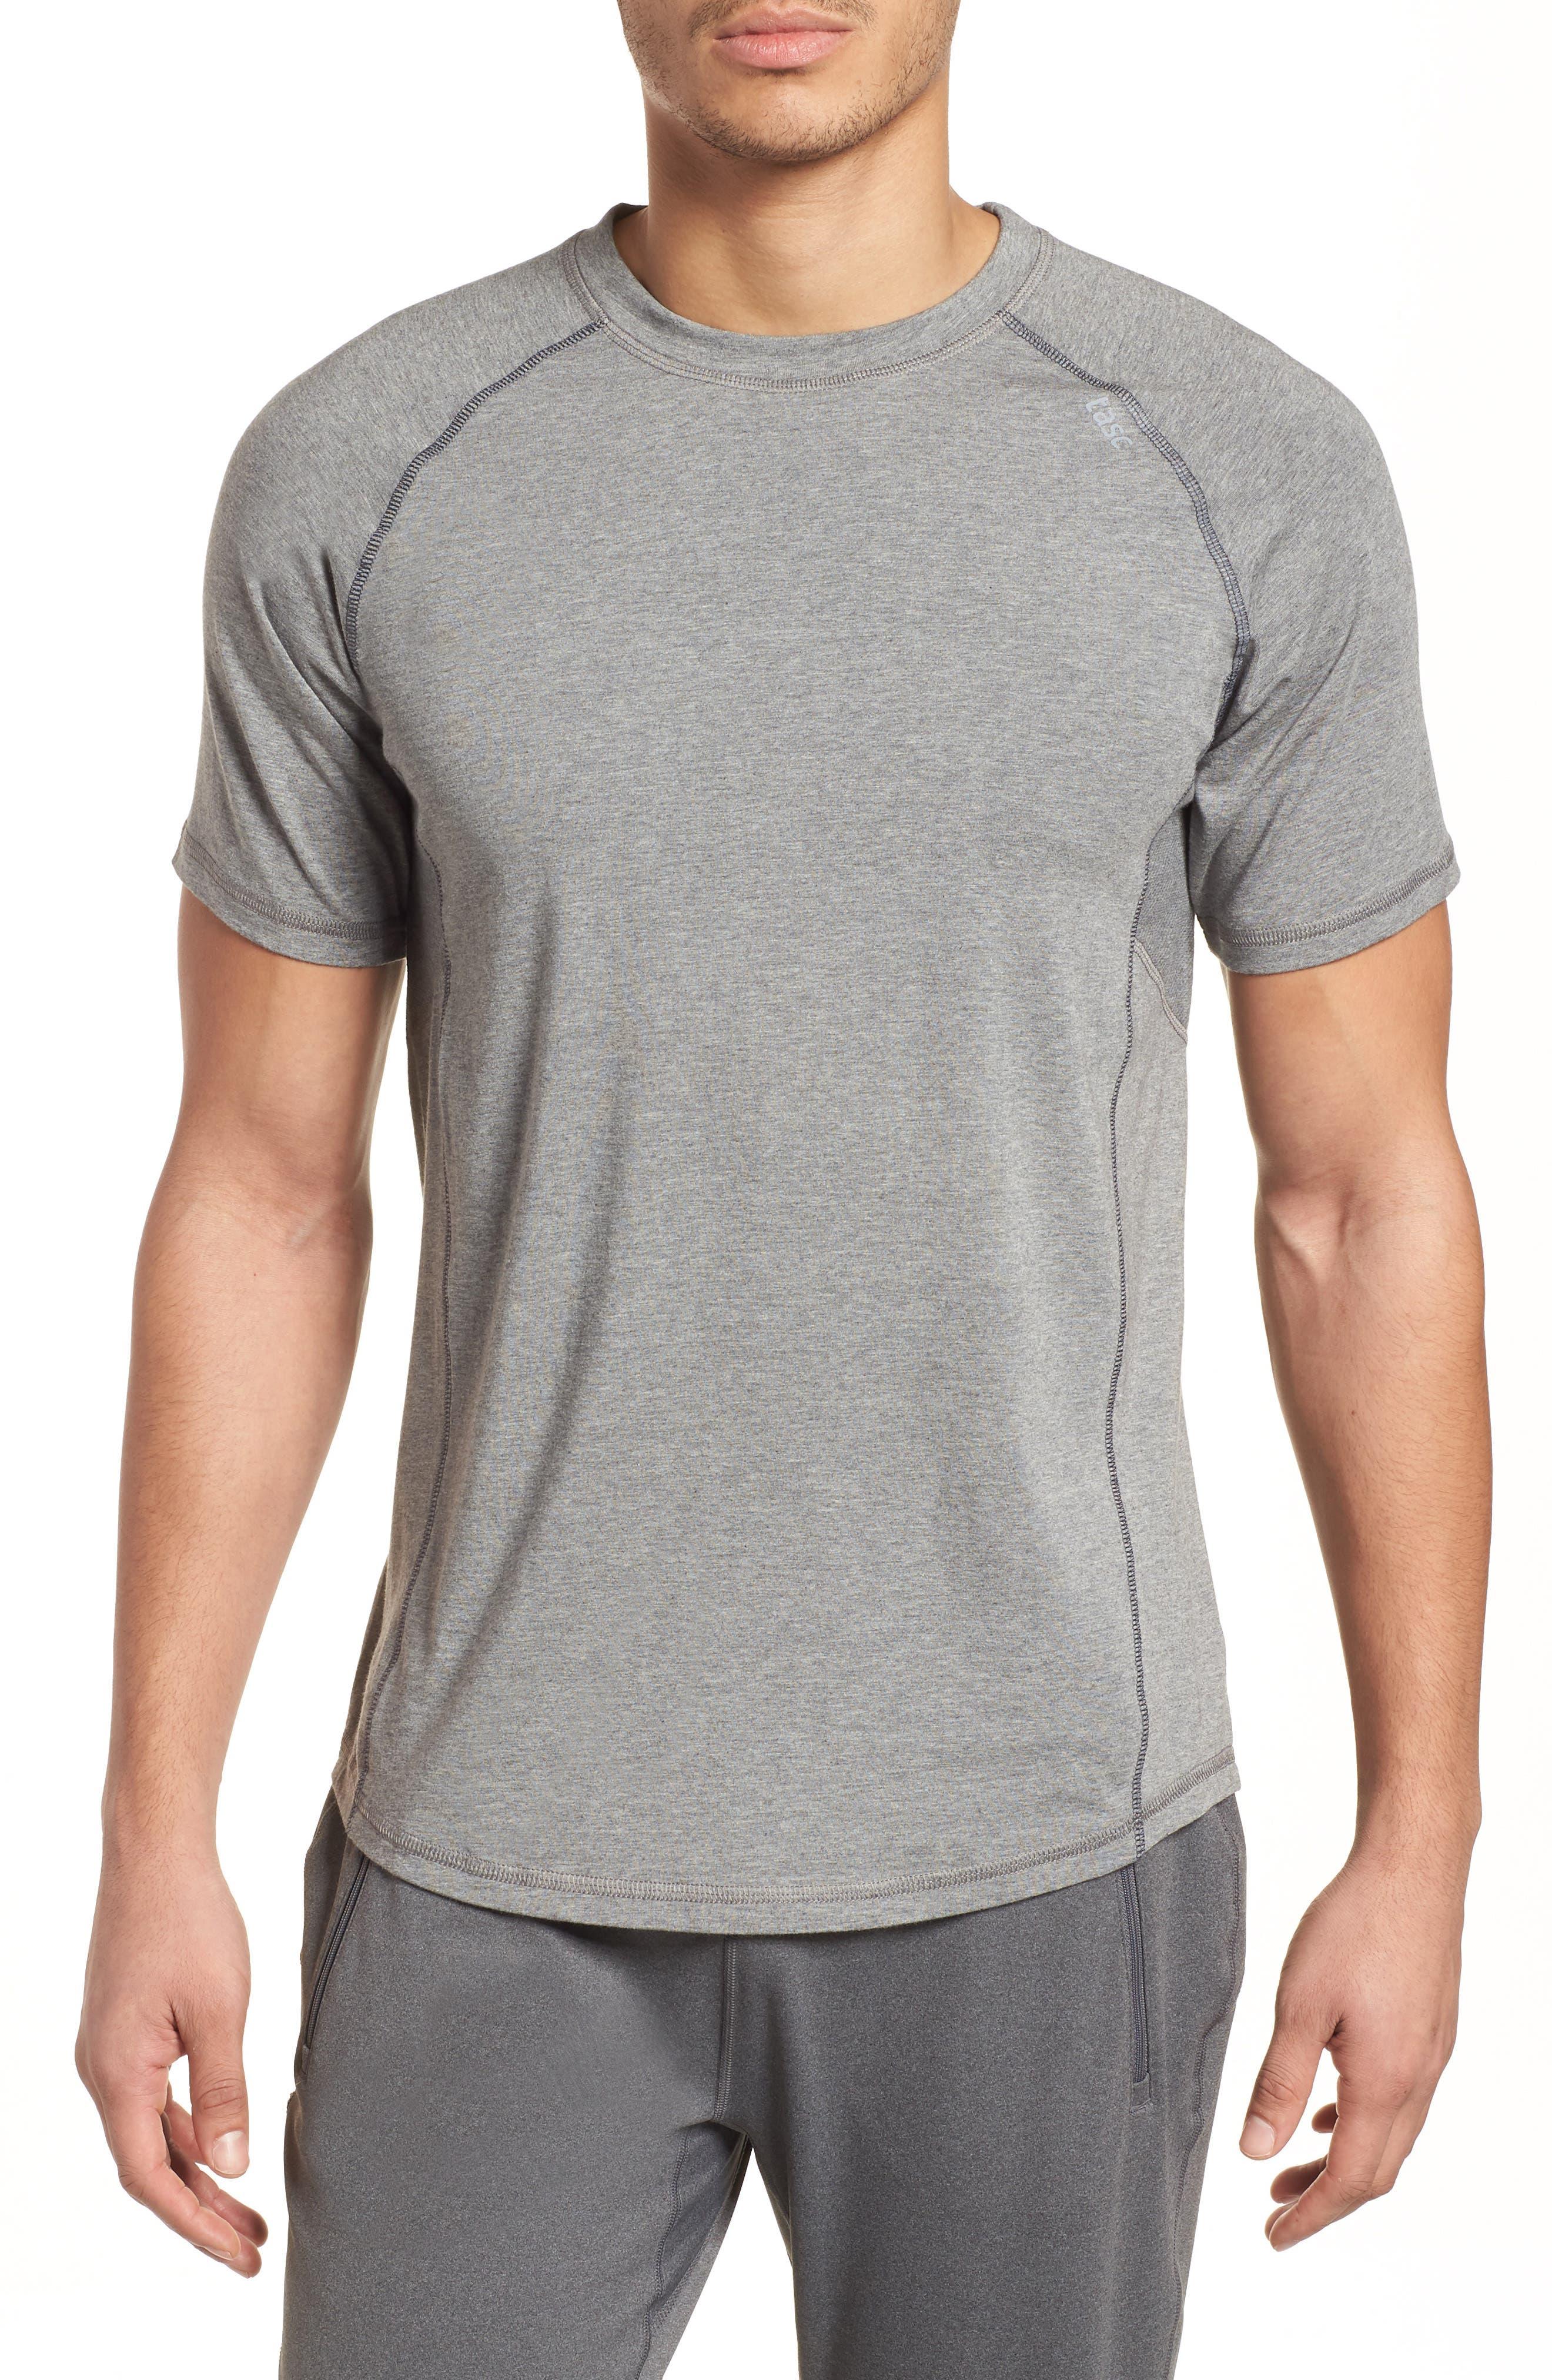 TASC PERFORMANCE Charge II T-Shirt, Main, color, HEATHER GREY